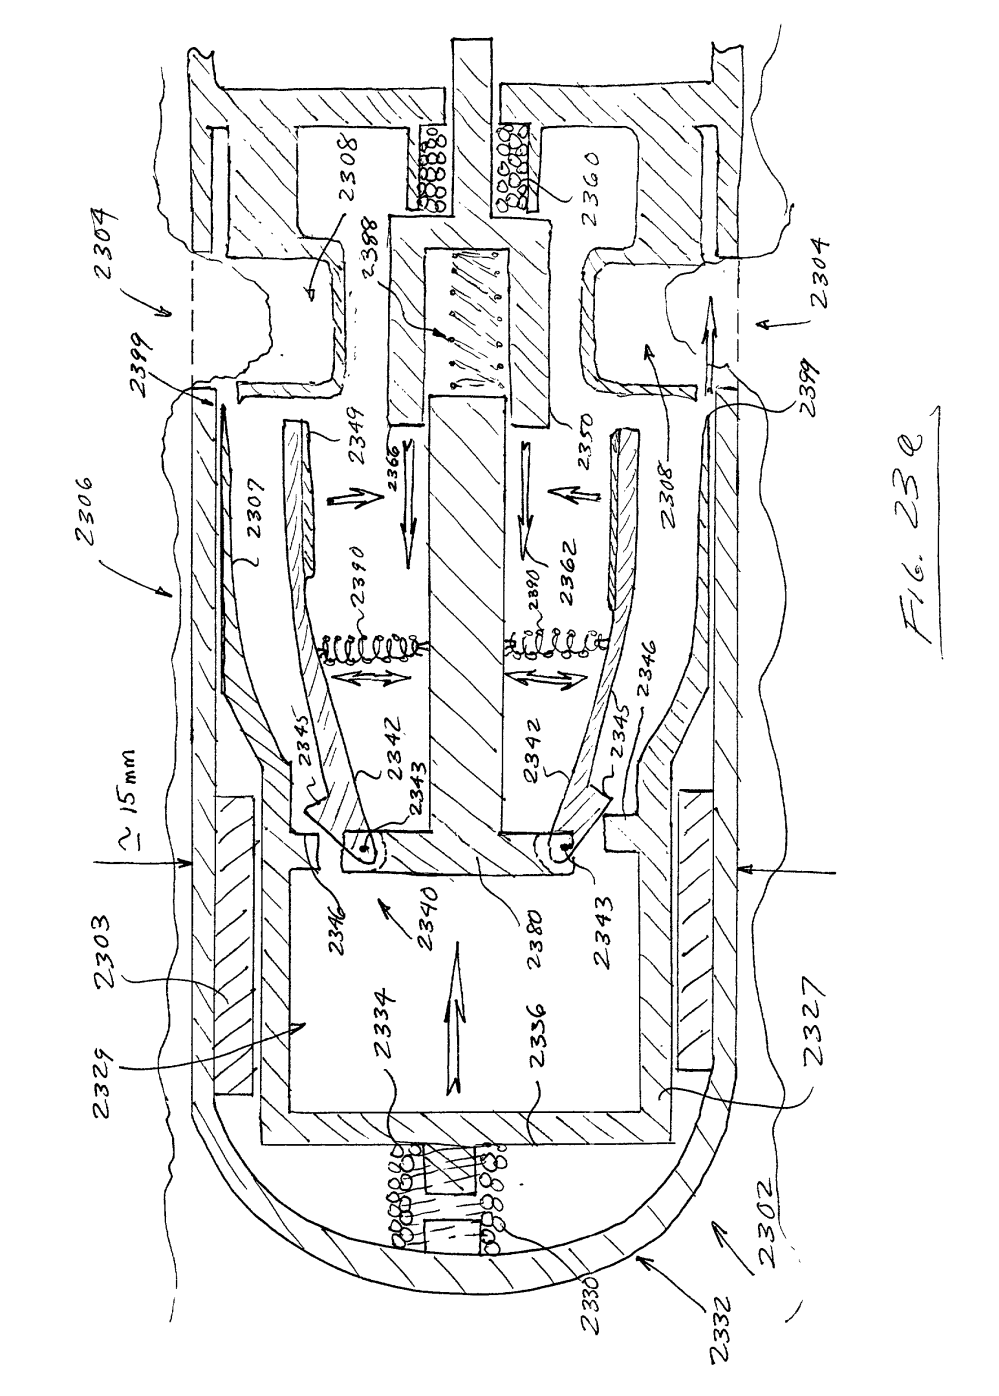 medium resolution of honda cm200t motorcycle wiring diagrams honda motorcycle fuel system wiring diagram elsalvadorla